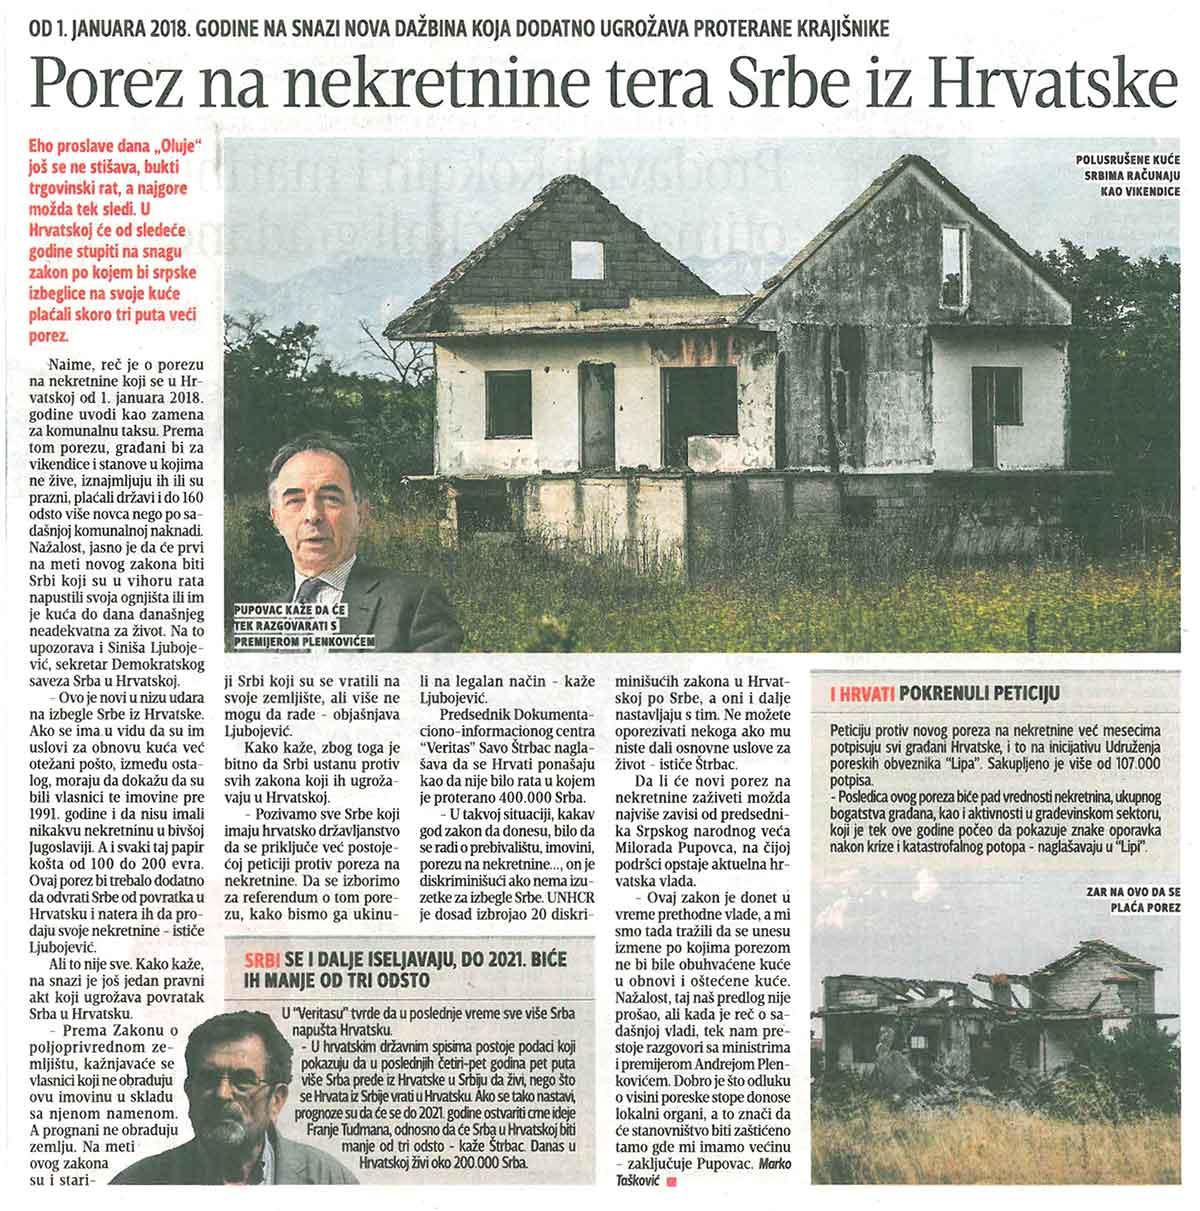 Blic, 09.08.2017, Porez na nekretnine tera Srbe iz Hrvatske